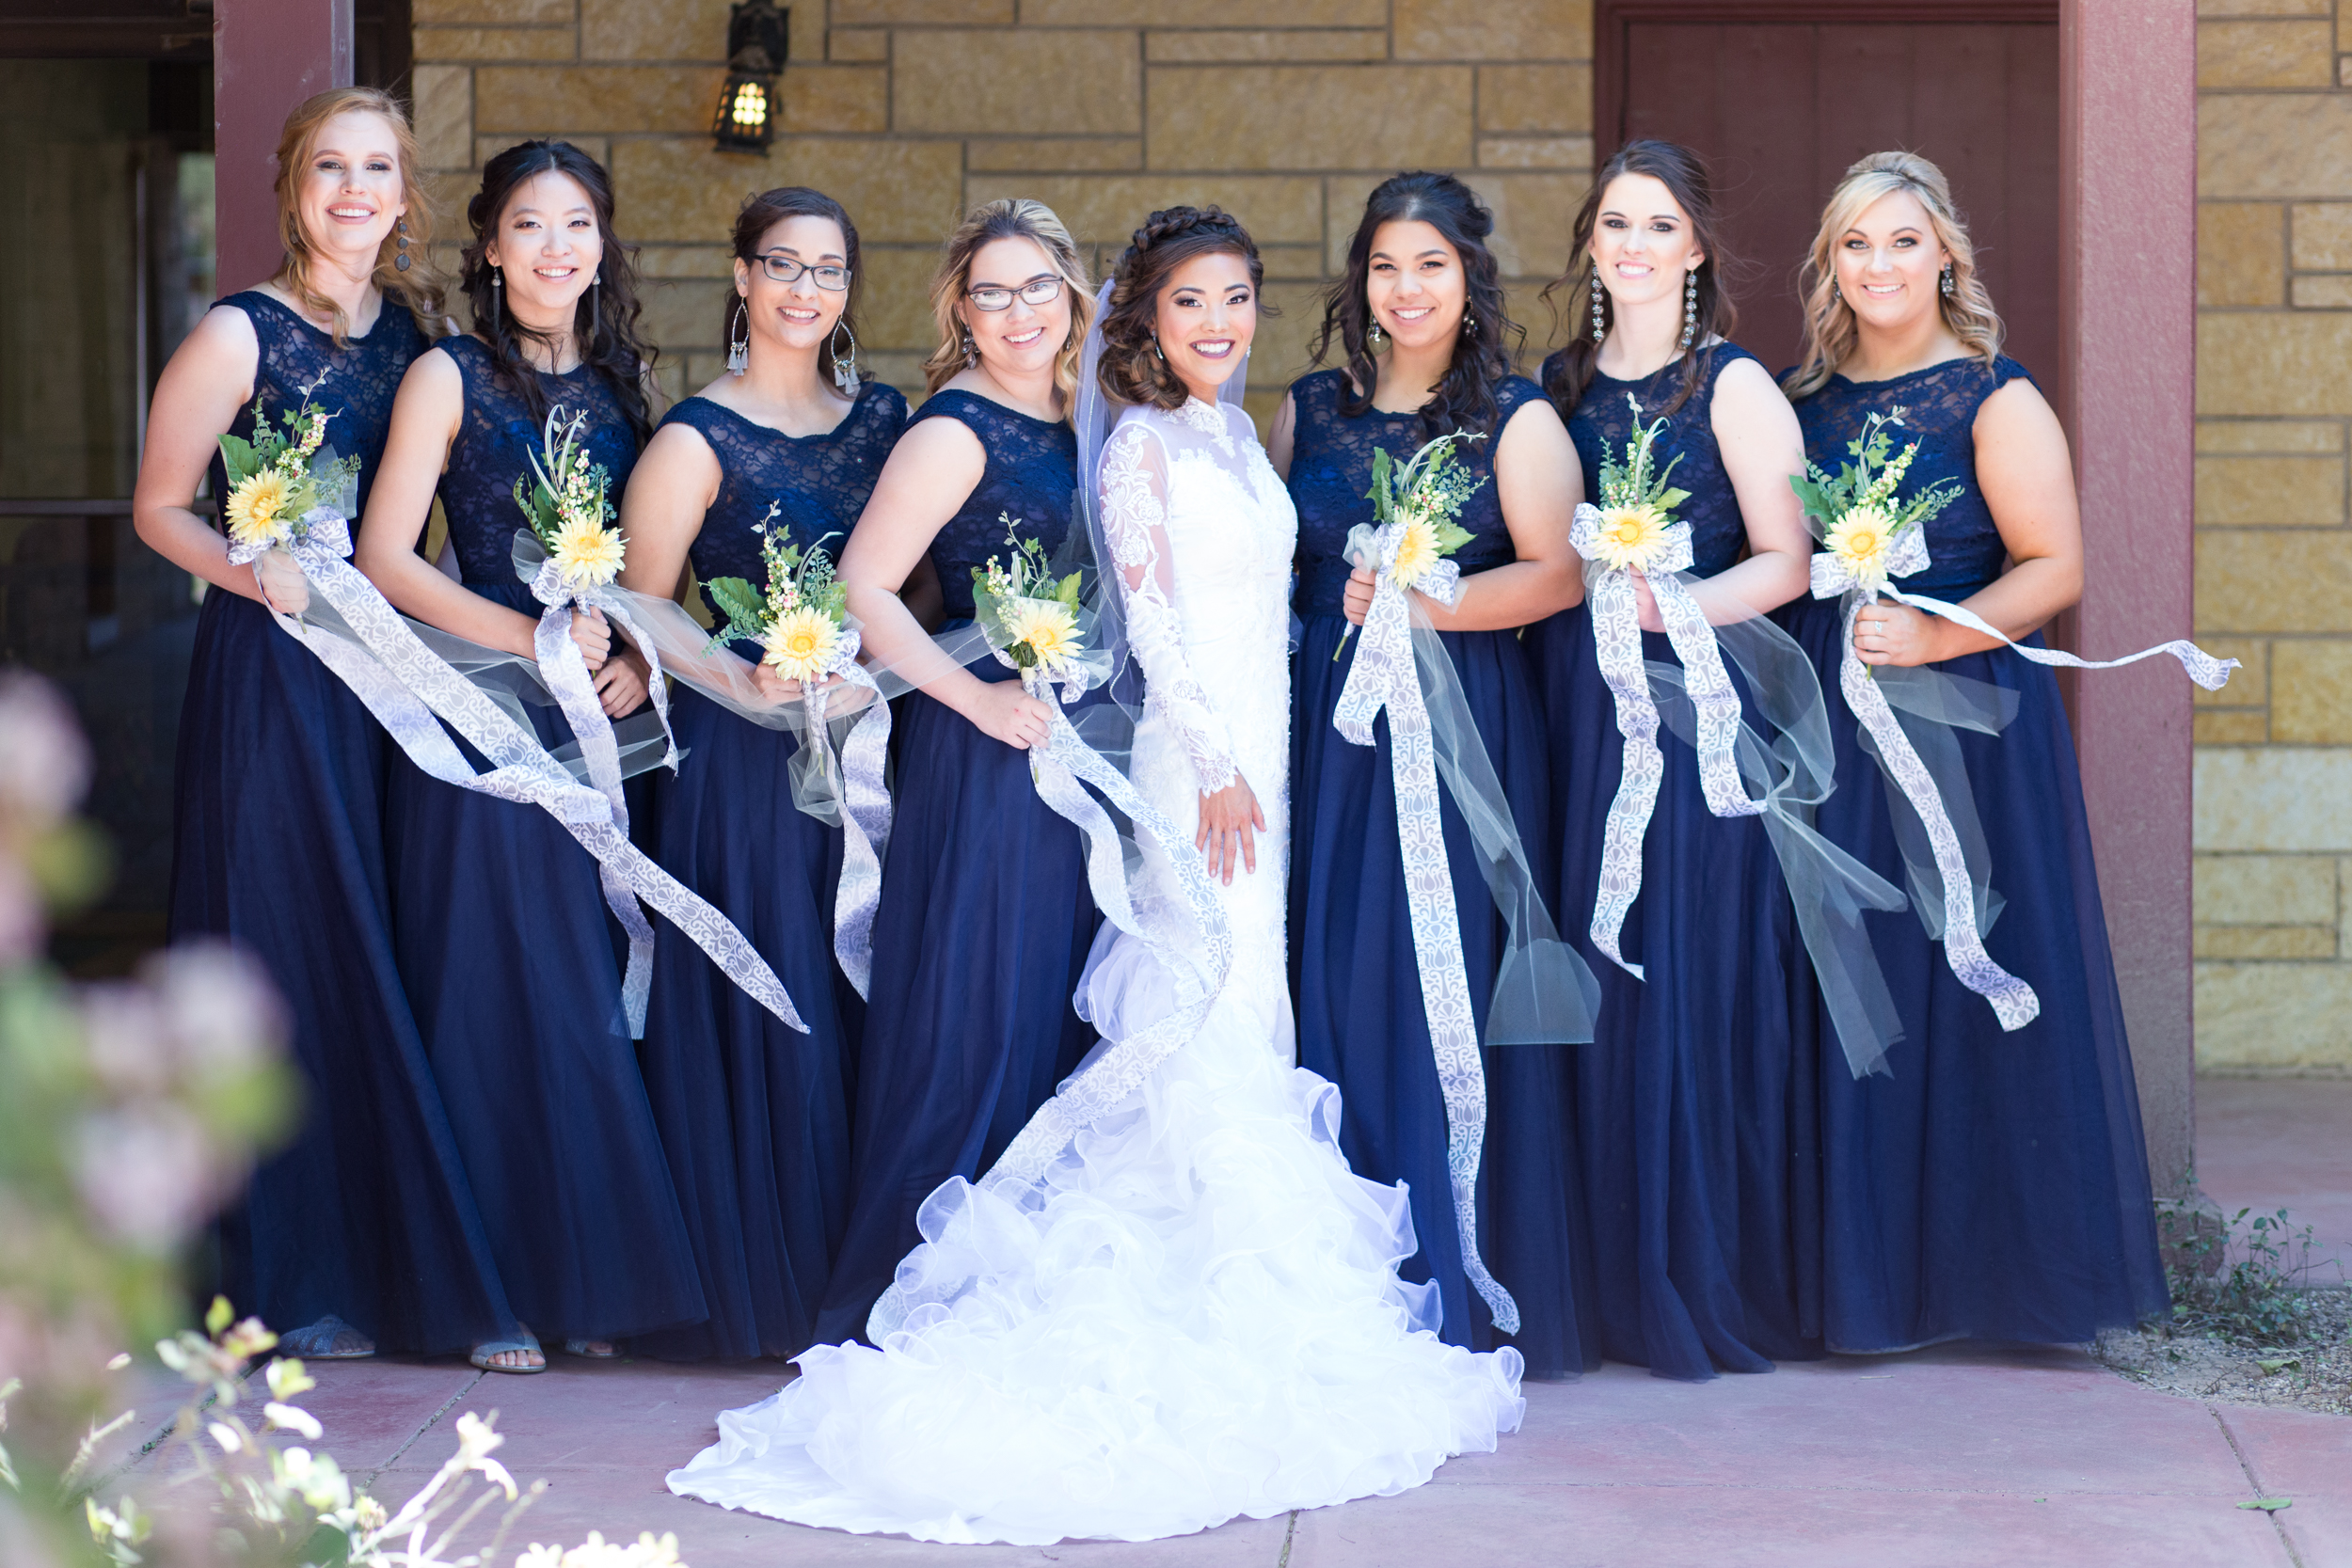 hall_wedding blog_kelsie hendricks photography_odessa_ west texas-34.jpg